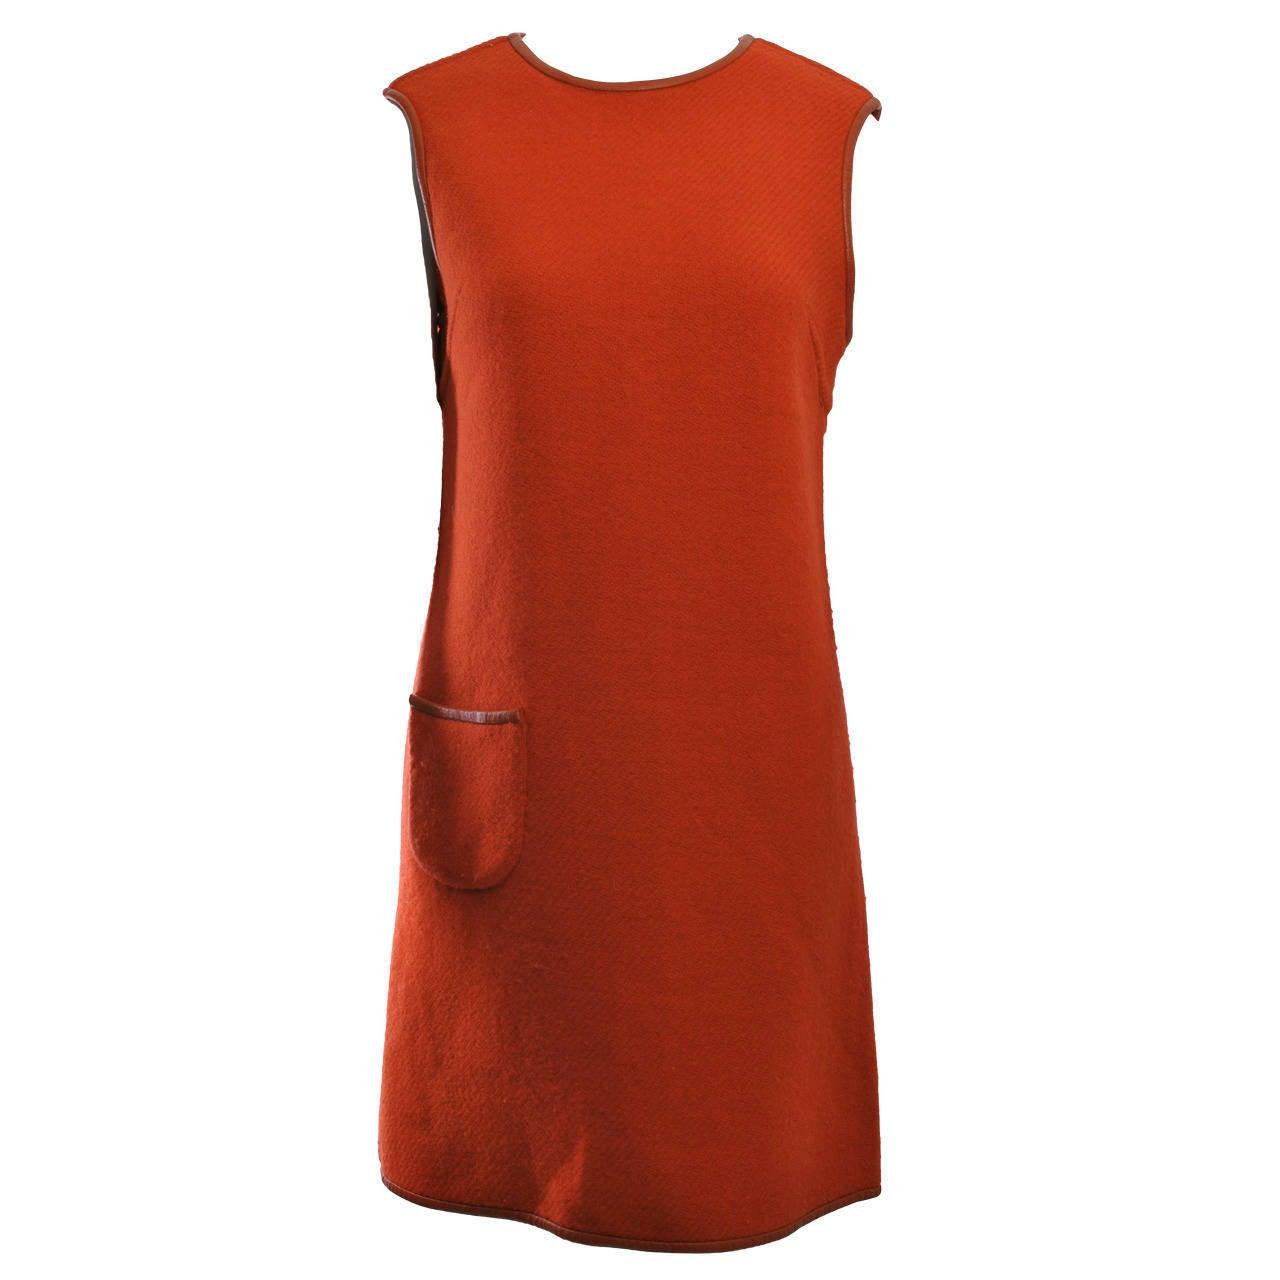 1960s Reversible Wool Dress w/Leather Trim